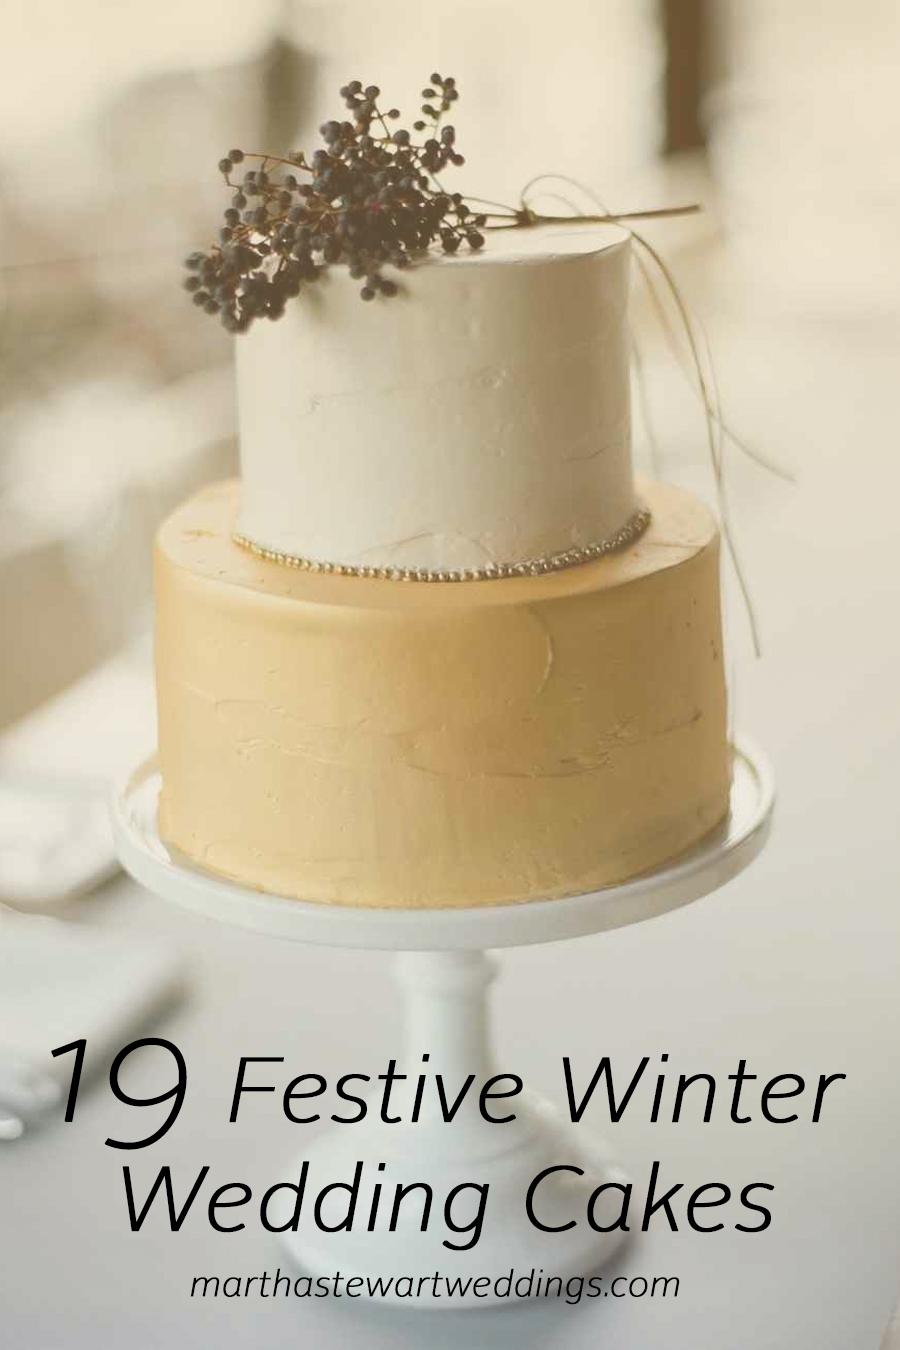 19 Festive Wedding Cakes | Martha Stewart Weddings Best Cake for birthday  #cakerecipe  #dessert